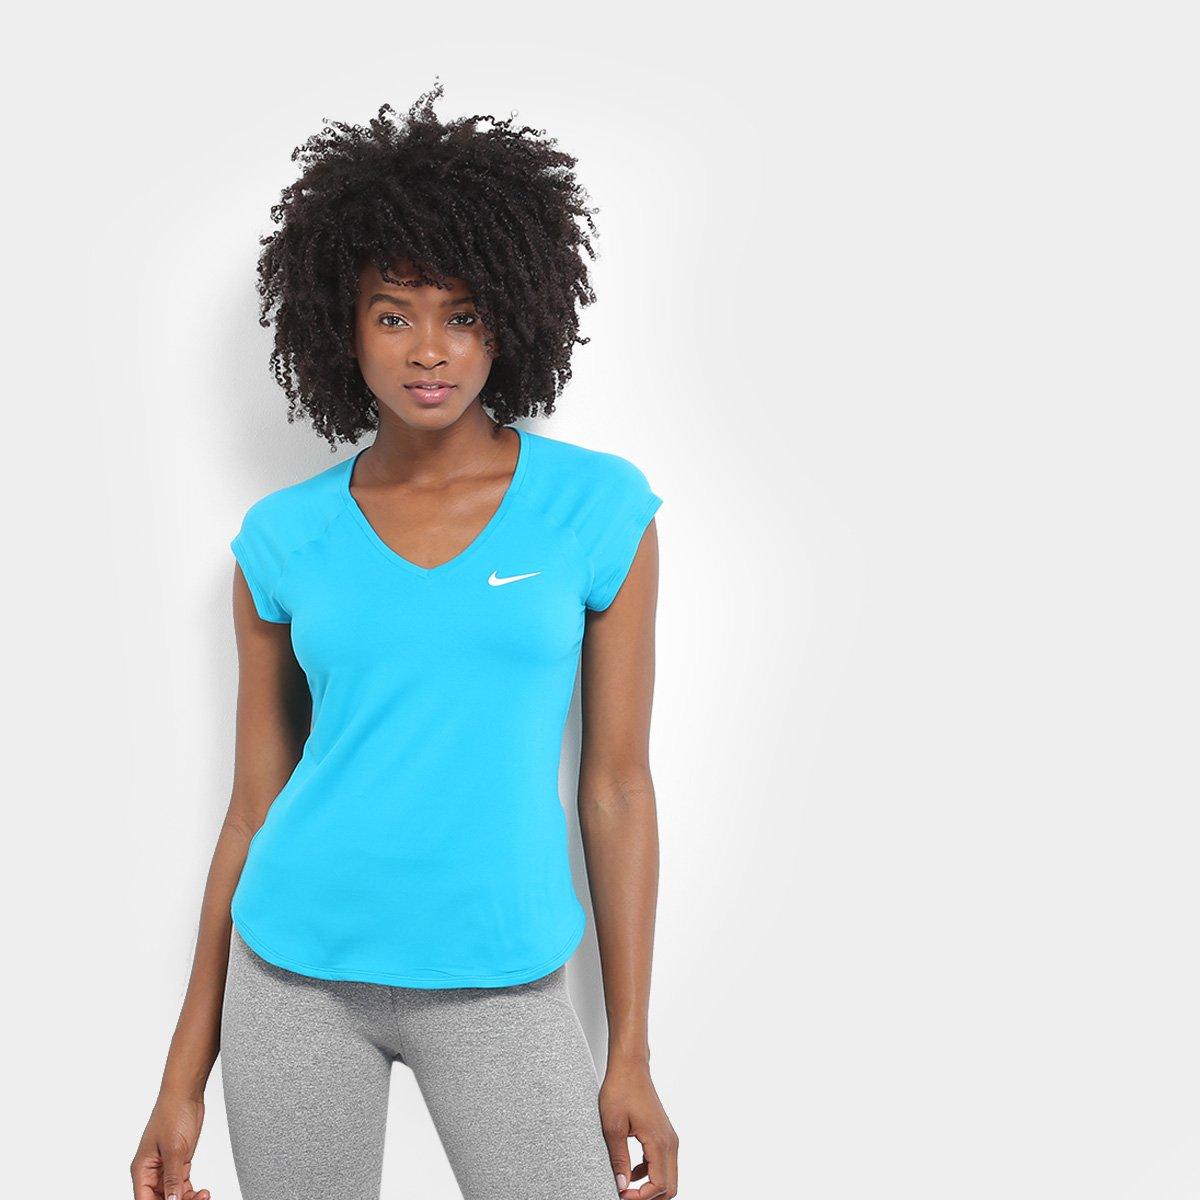 Camiseta Nike Camiseta Azul Feminina Pure Nike Royal BHrwqB